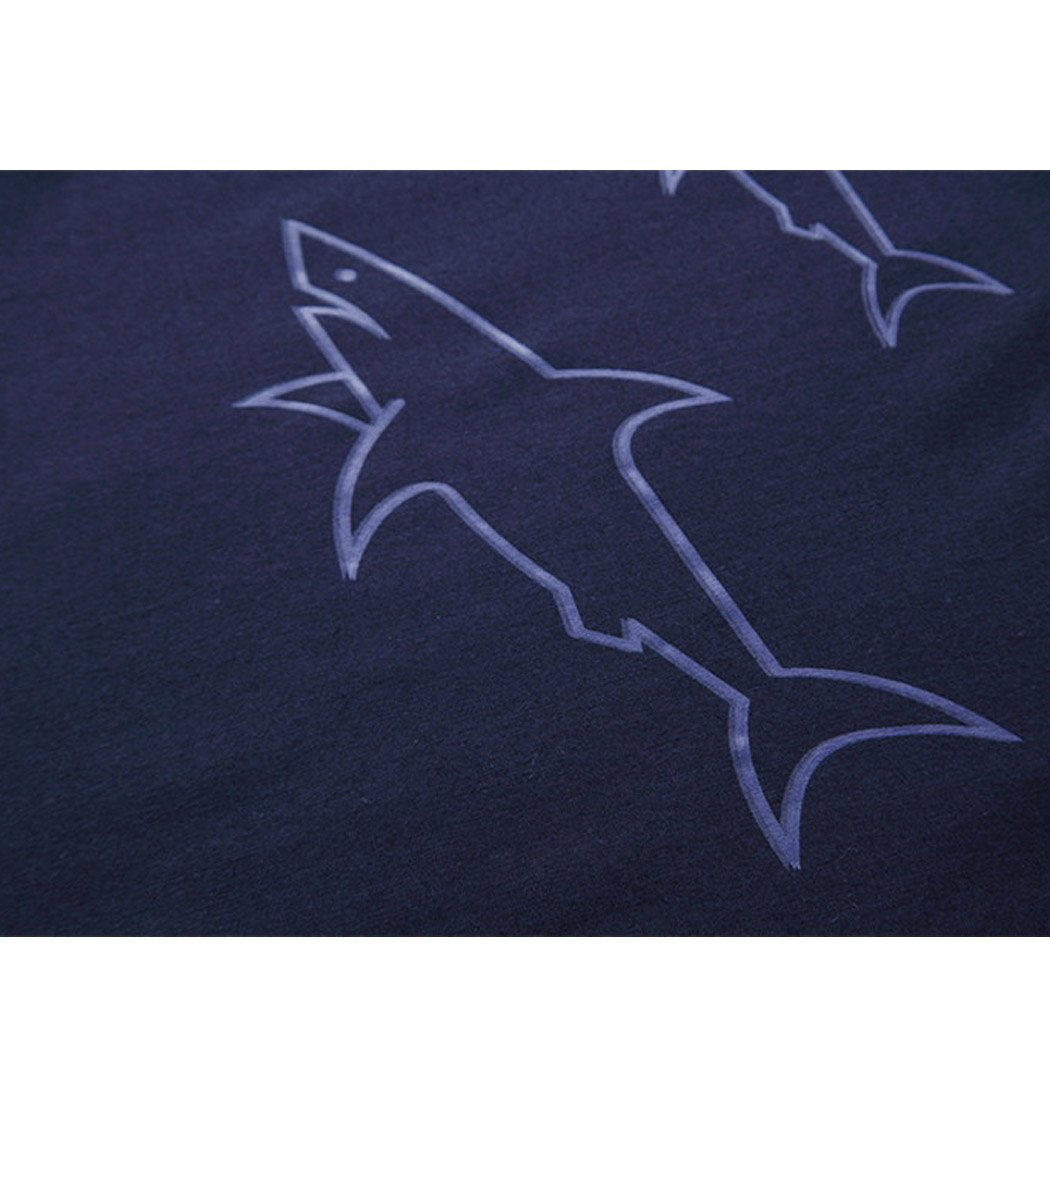 Синий лонгслив Paul Shark LP1 - Синий - Вид 5